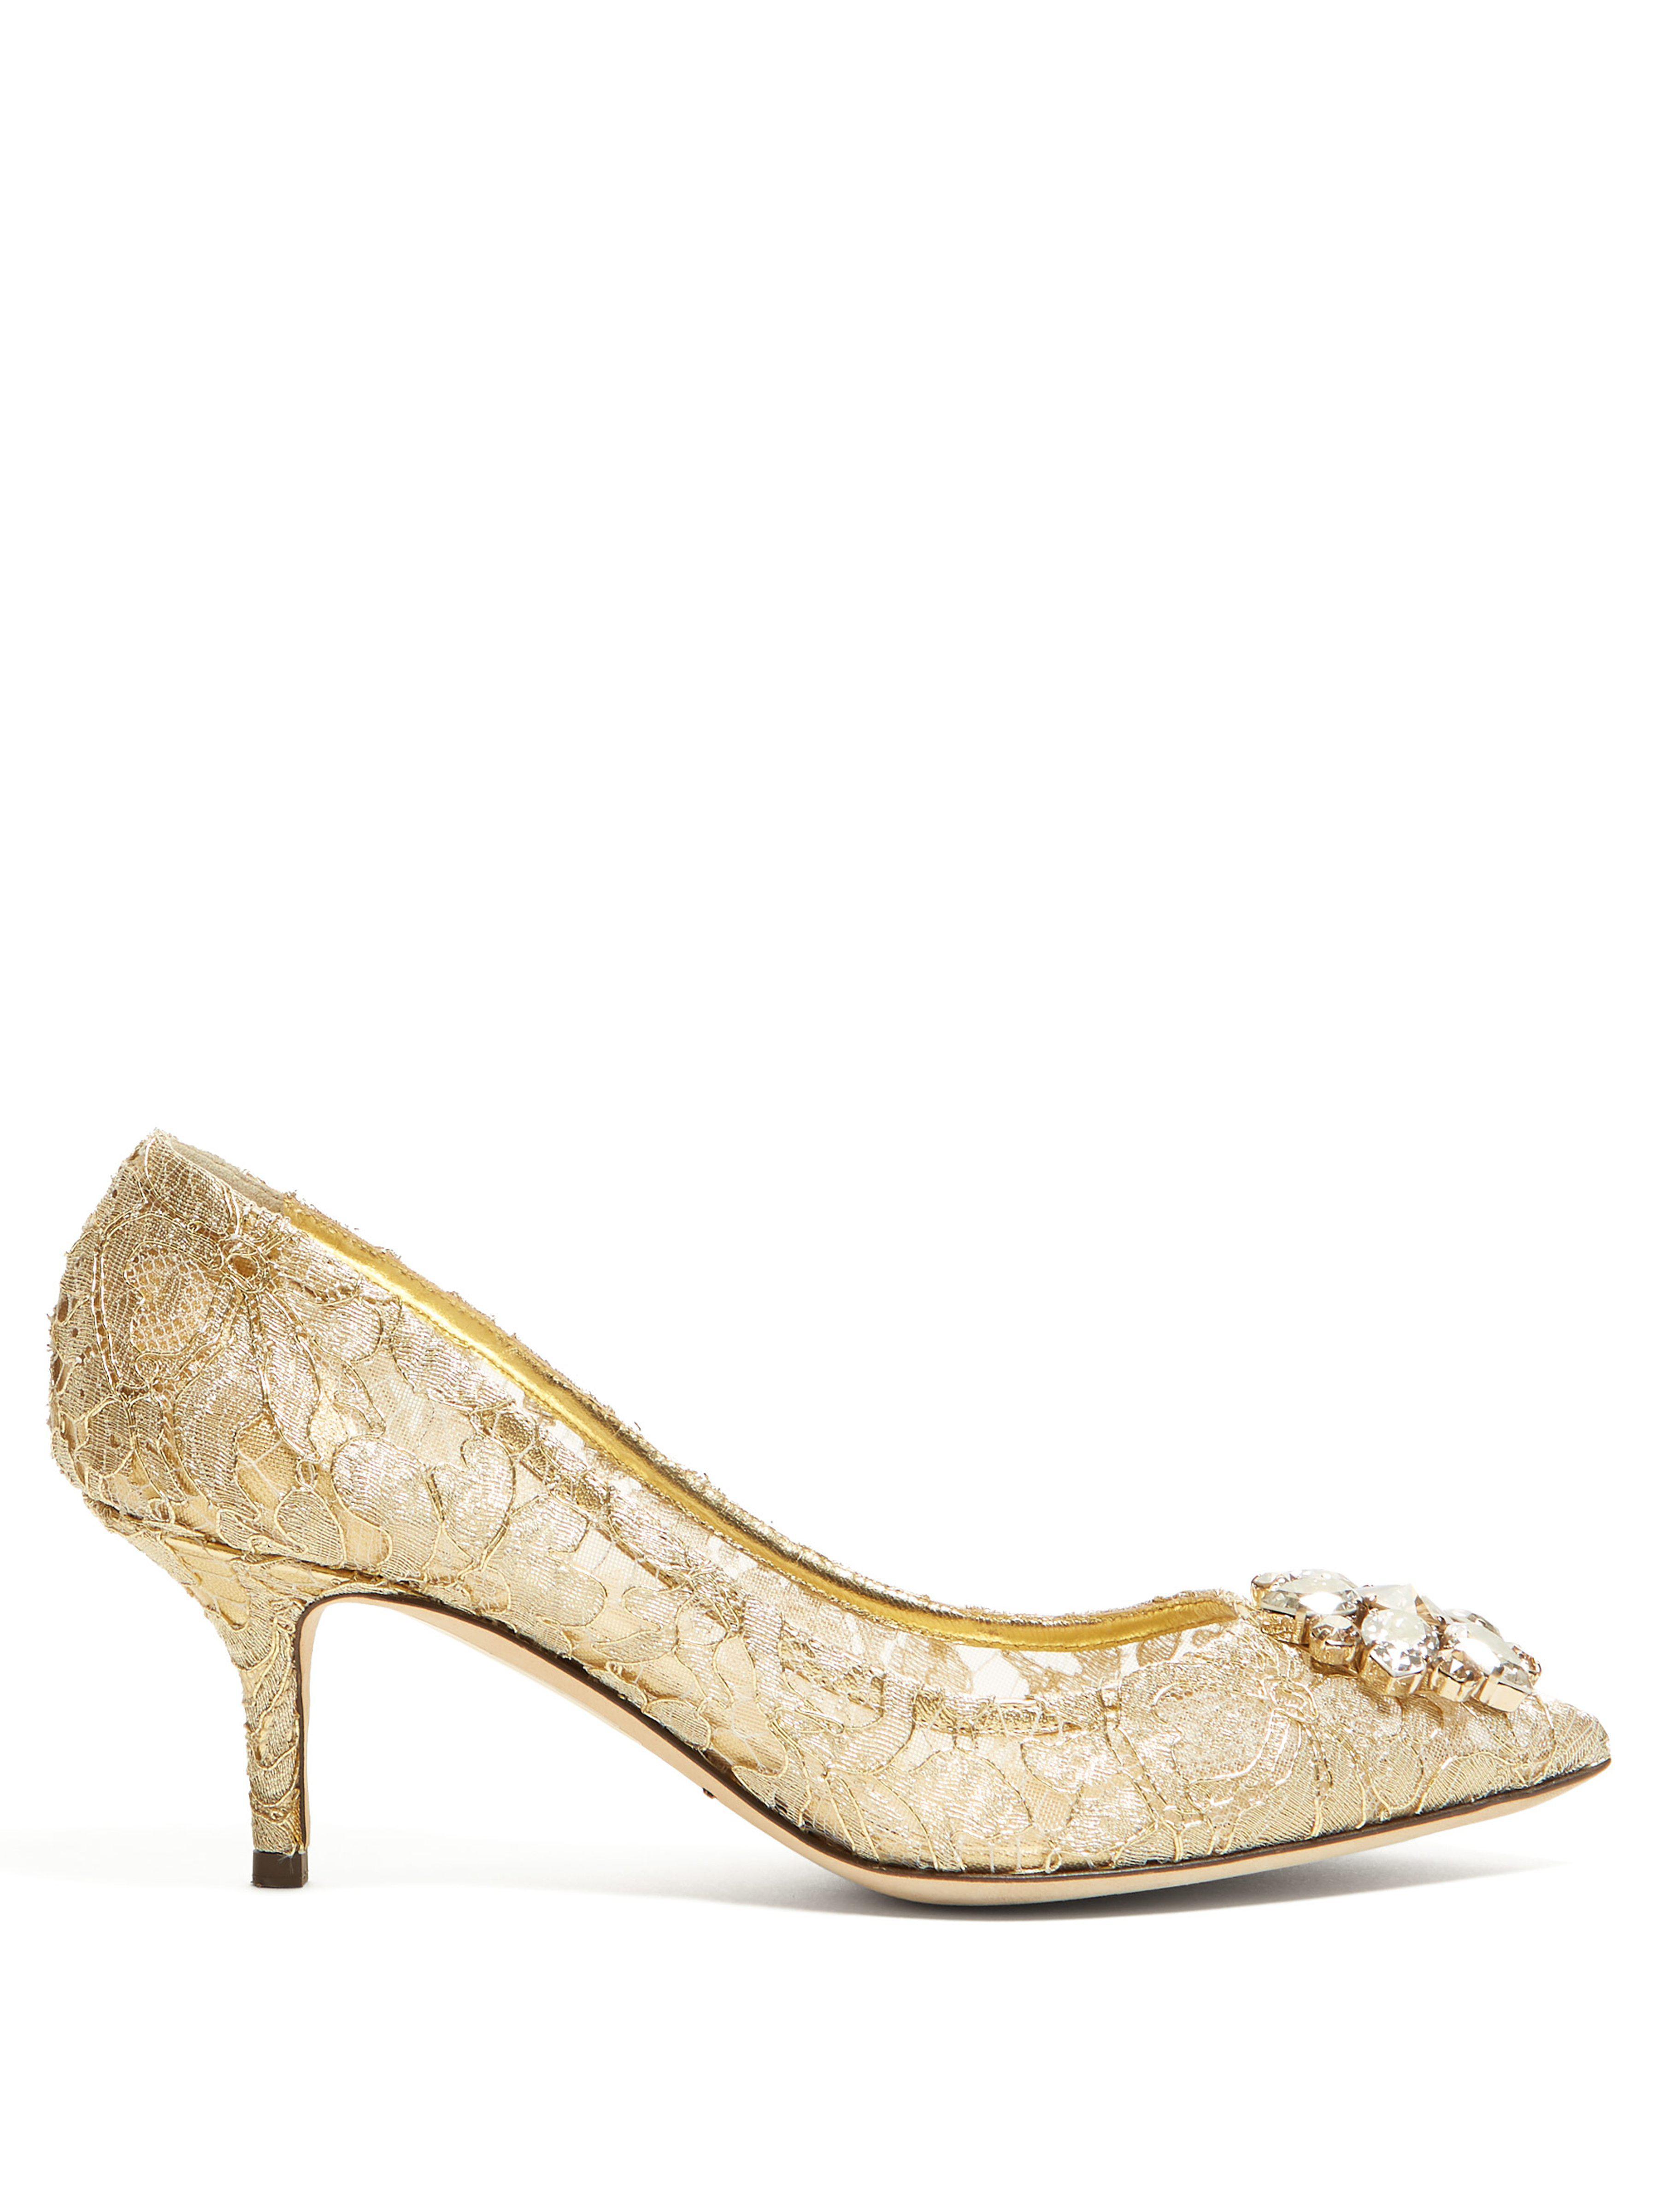 d6ce1af48092 Dolce   Gabbana. Women s Metallic Bellucci Crystal Embellished Lace Court  Shoes